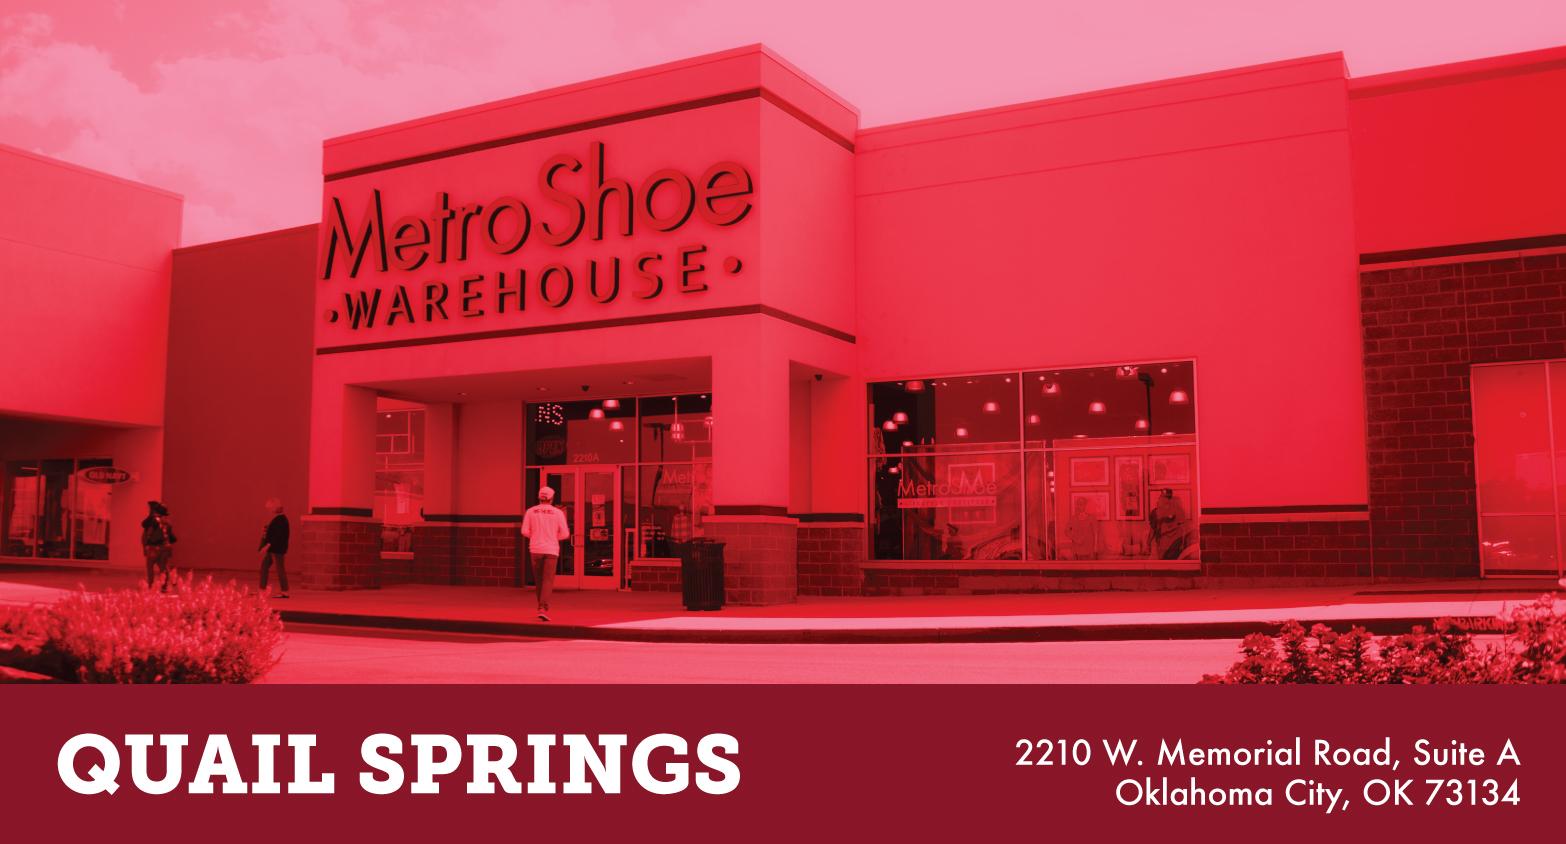 Metro shoe warehouse okc